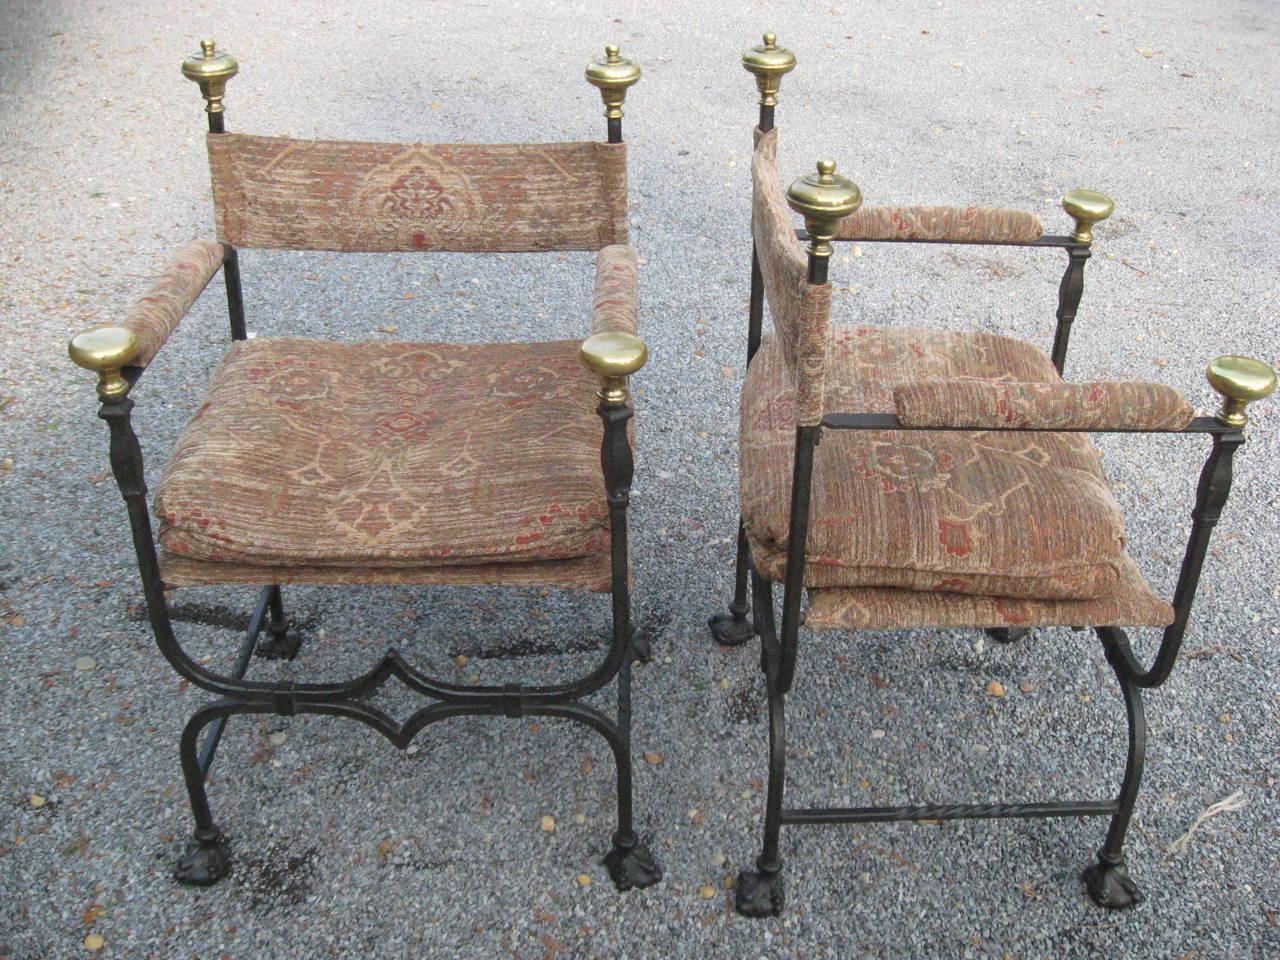 European 19th Century Italian Savonarola Chairs For Sale